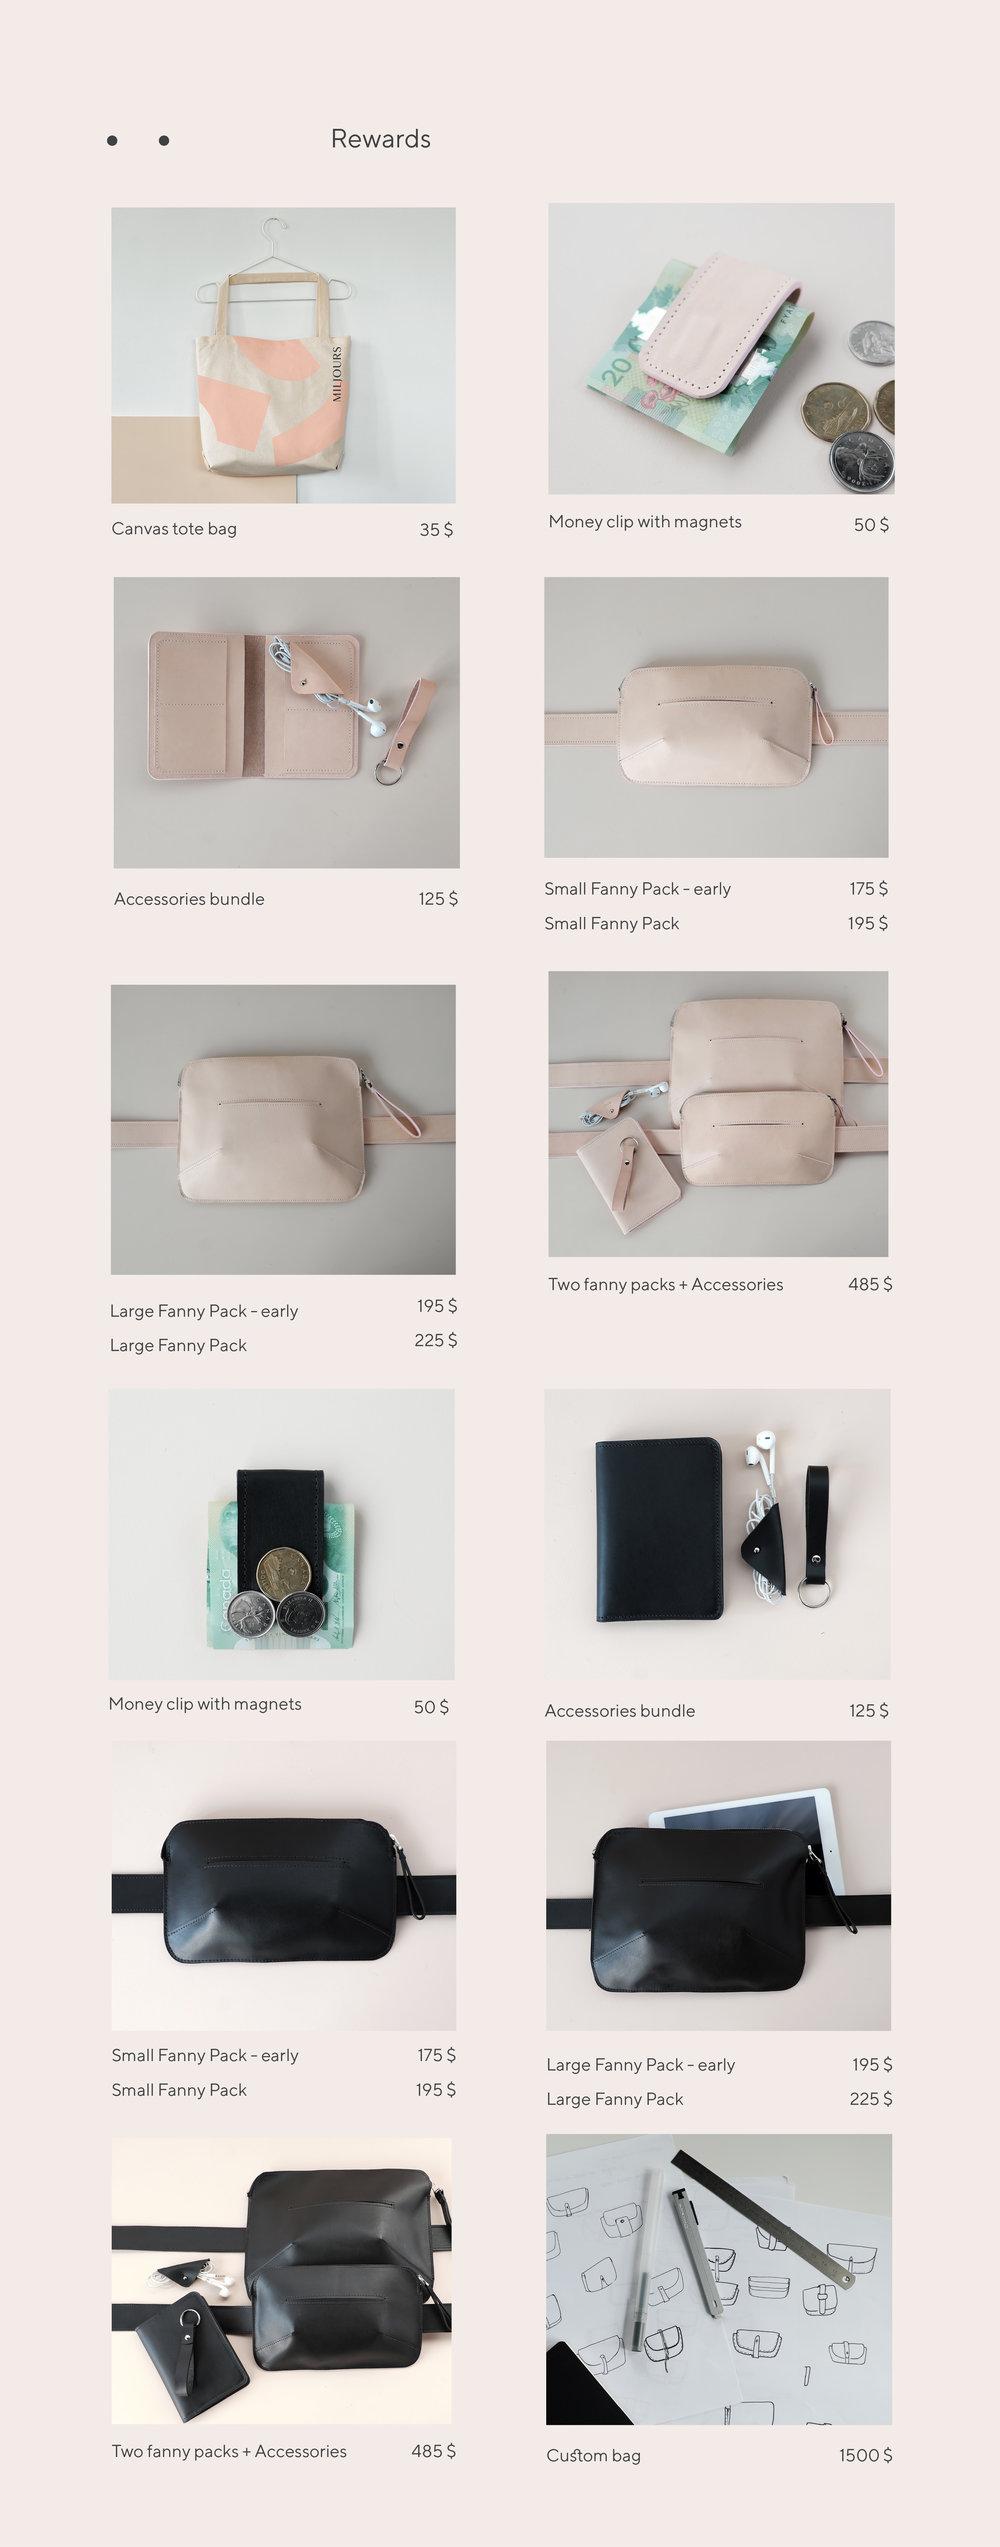 Miljours - Kickstarter - rewards - leathergoods.jpg